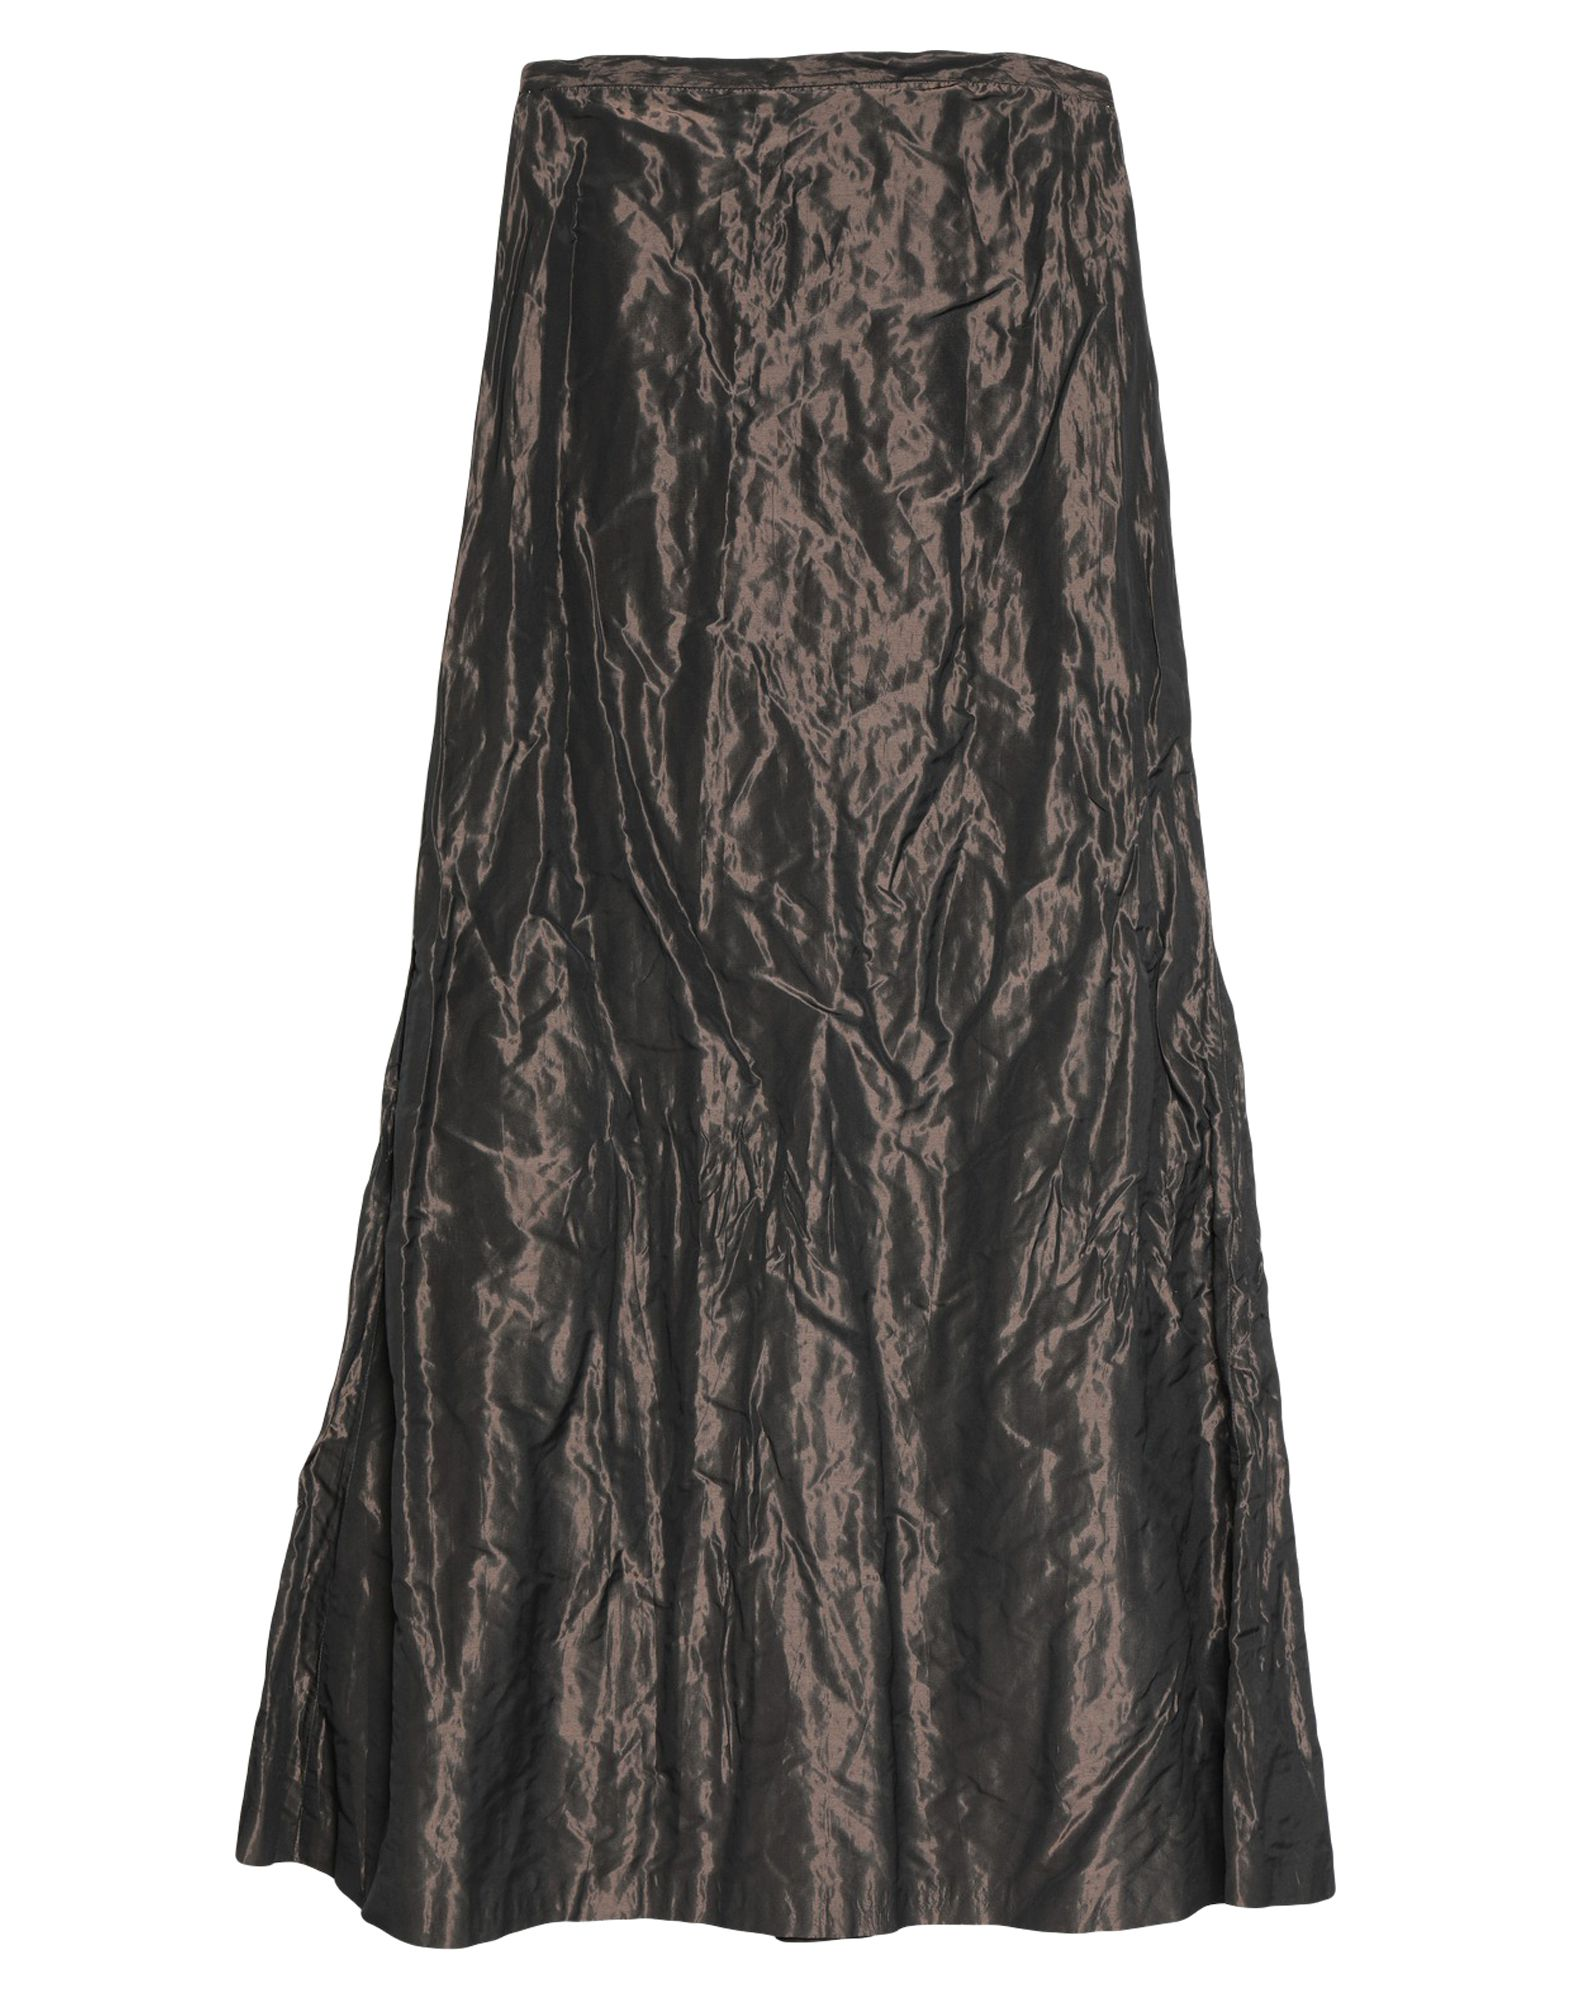 GIANFRANCO FERRE' STUDIO Длинная юбка ash studio paris длинная юбка